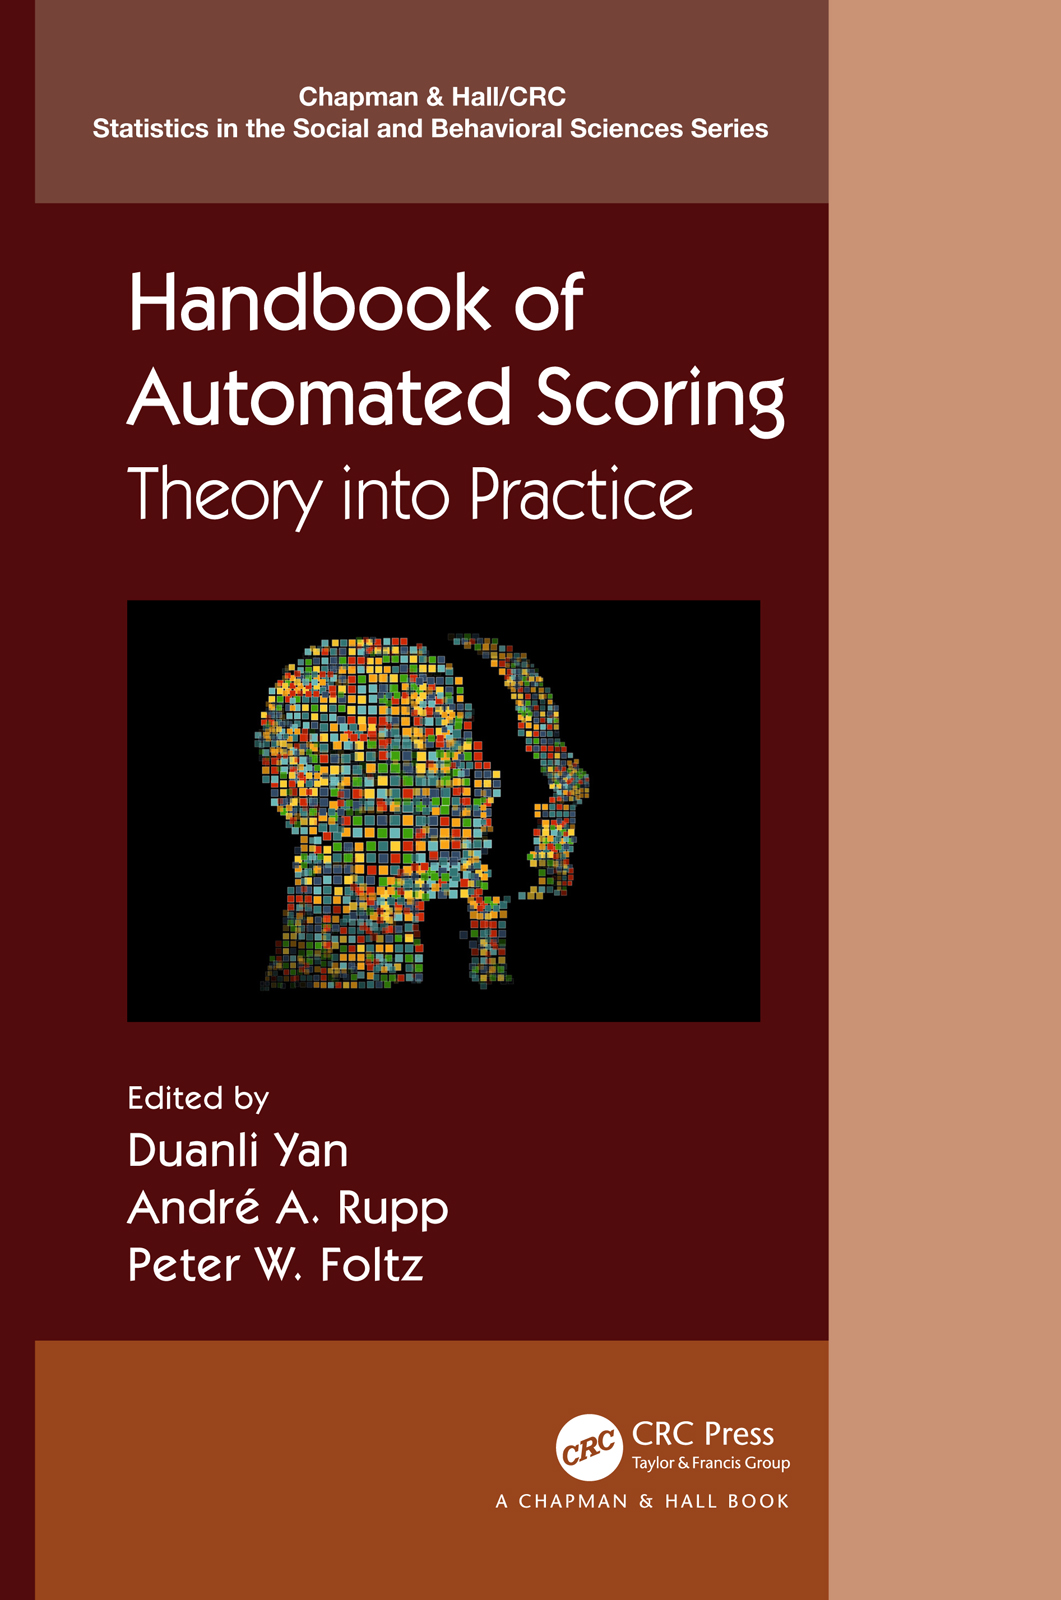 Handbook of Automated Scoring